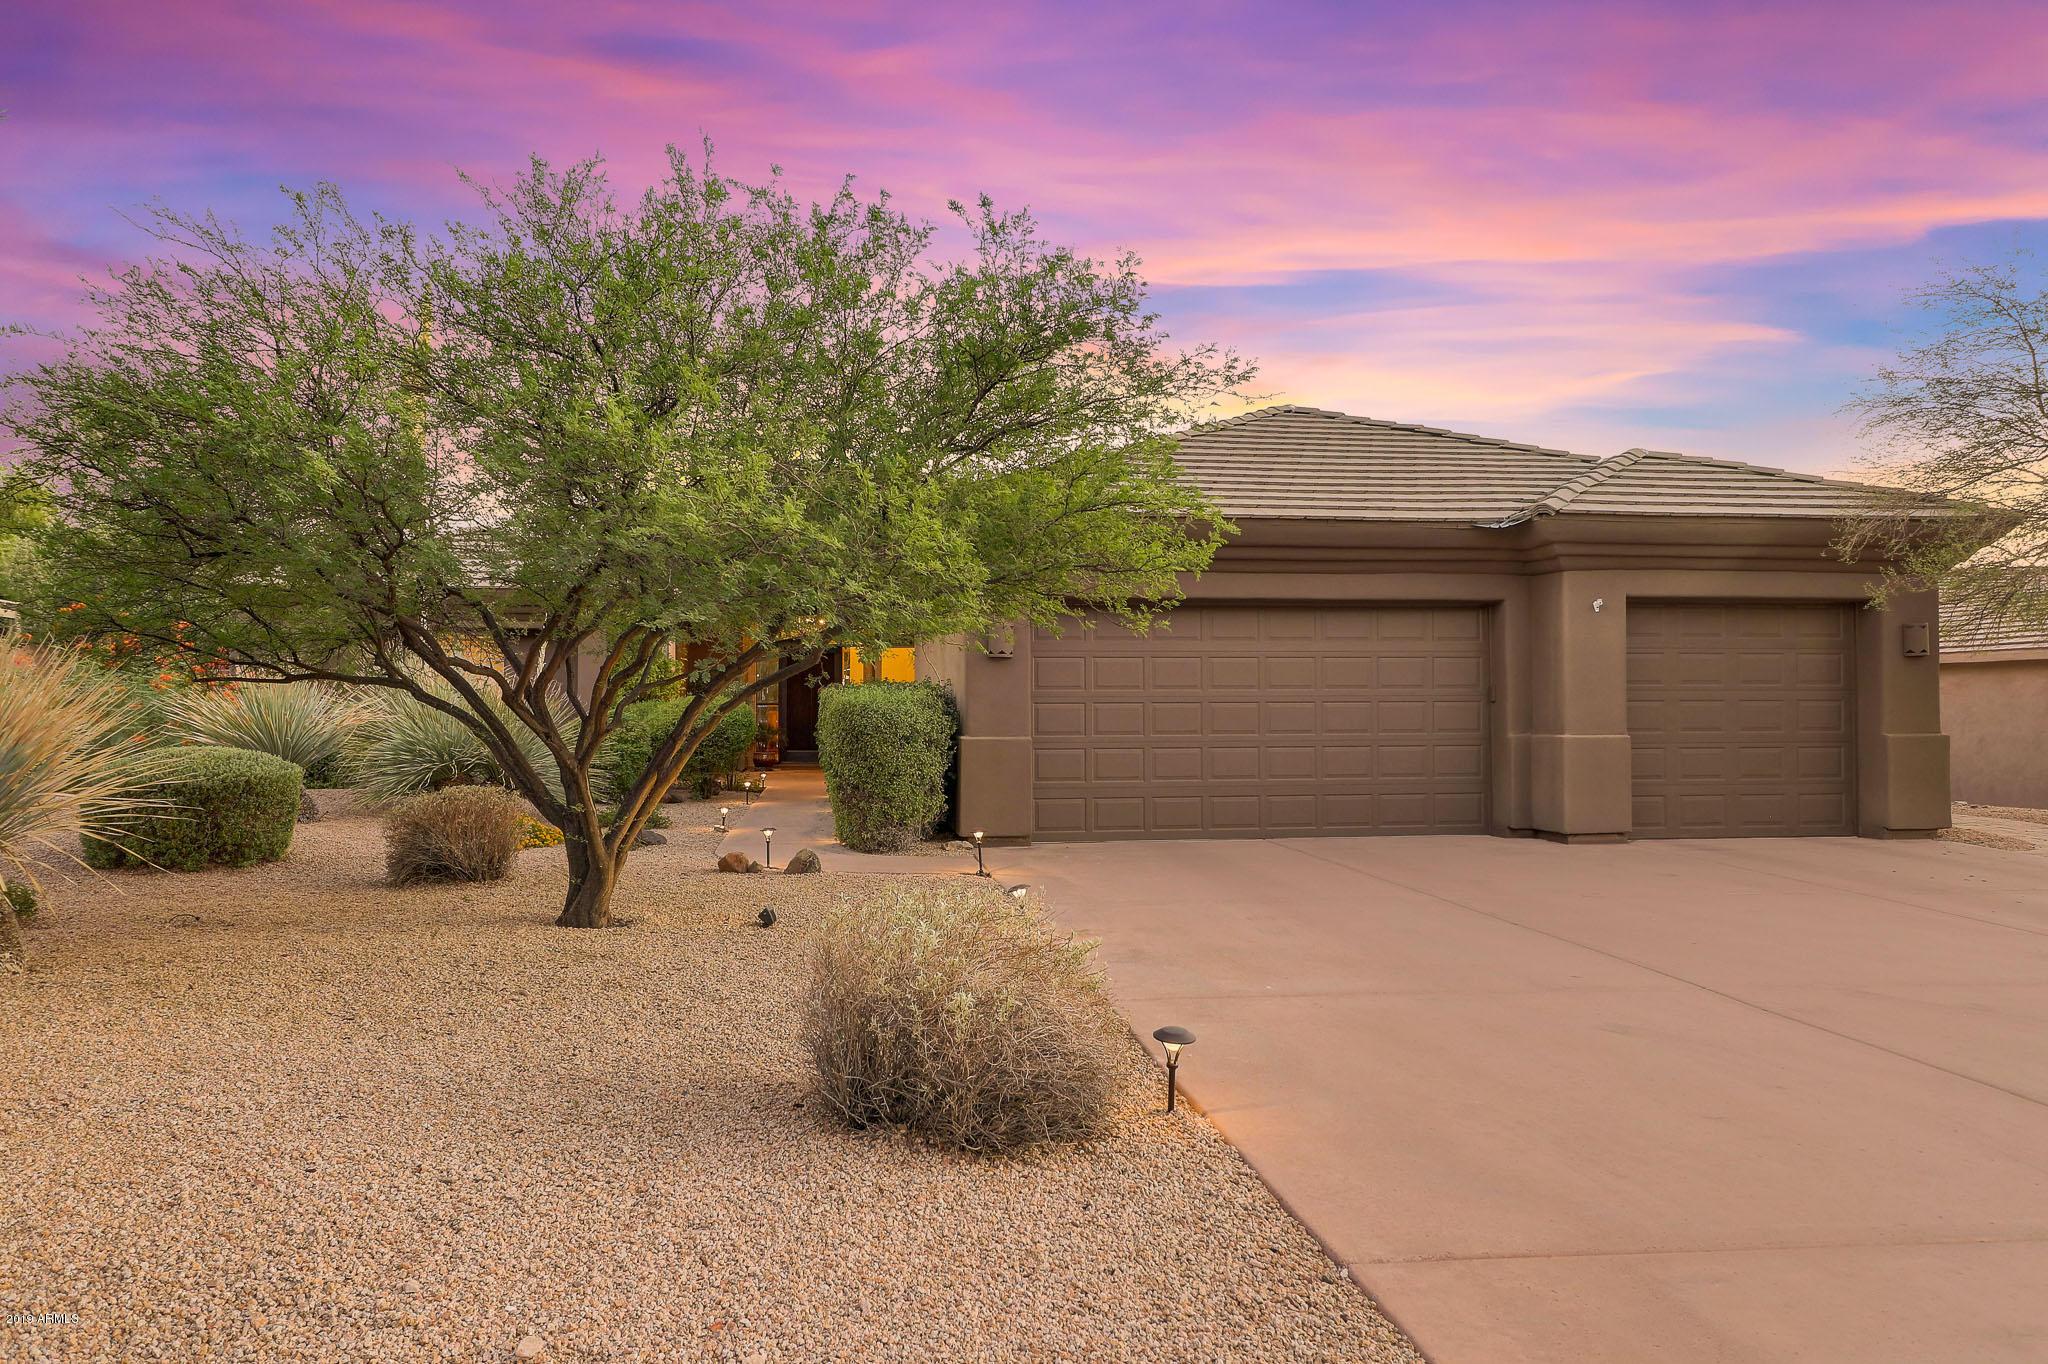 Photo of 11673 E CHARTER OAK Drive, Scottsdale, AZ 85259